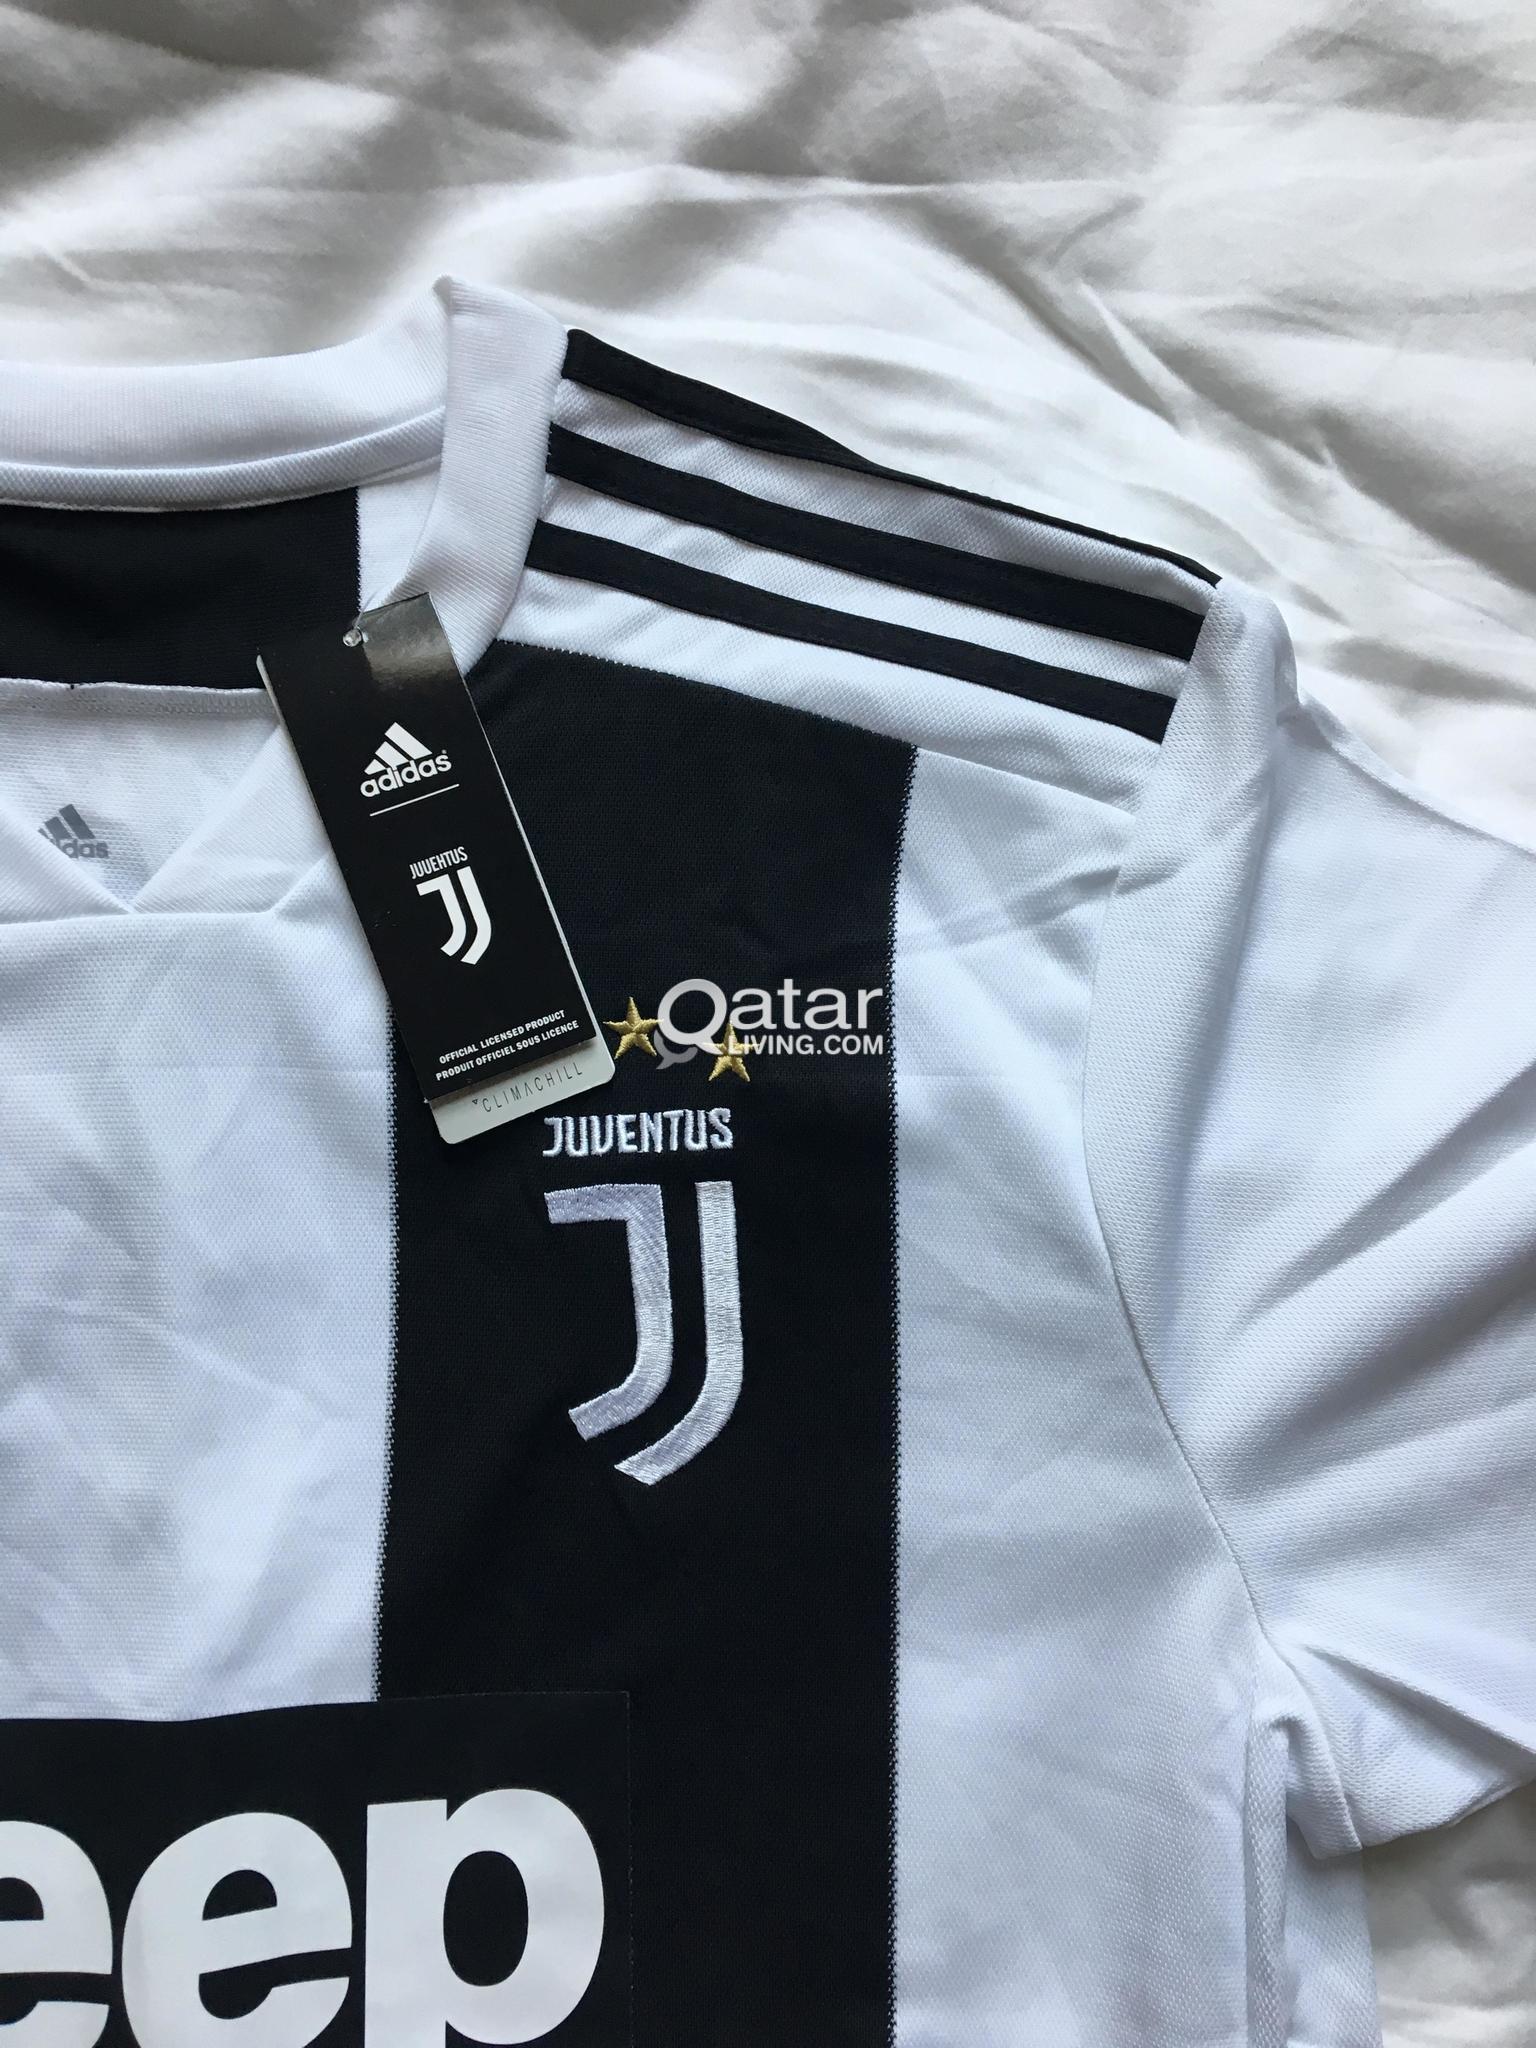 huge discount 5167c 2a074 Ronaldo Juventus Jersey Size XL New w/ Tags | Qatar Living